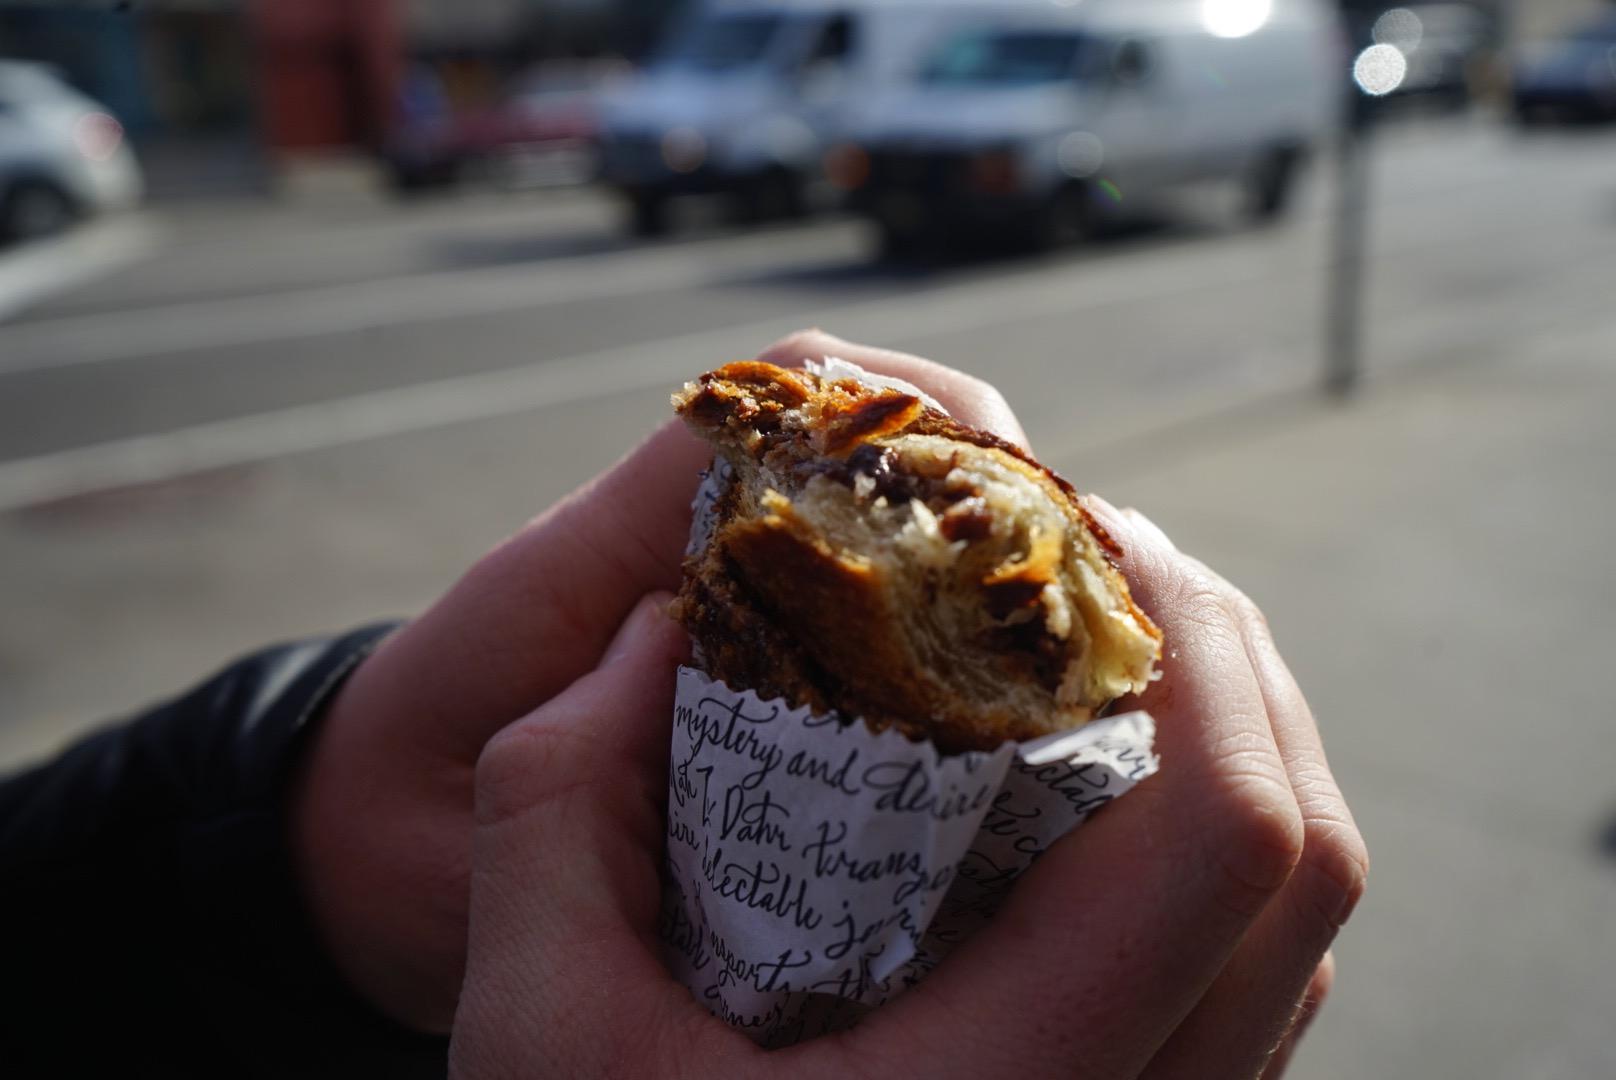 NEW-YORK-ANDAZ-BROOKLYN-USA-NYC-DISH-YOU-WERE-HERE-LUXURY-FOOD-TRAVEL247.jpeg